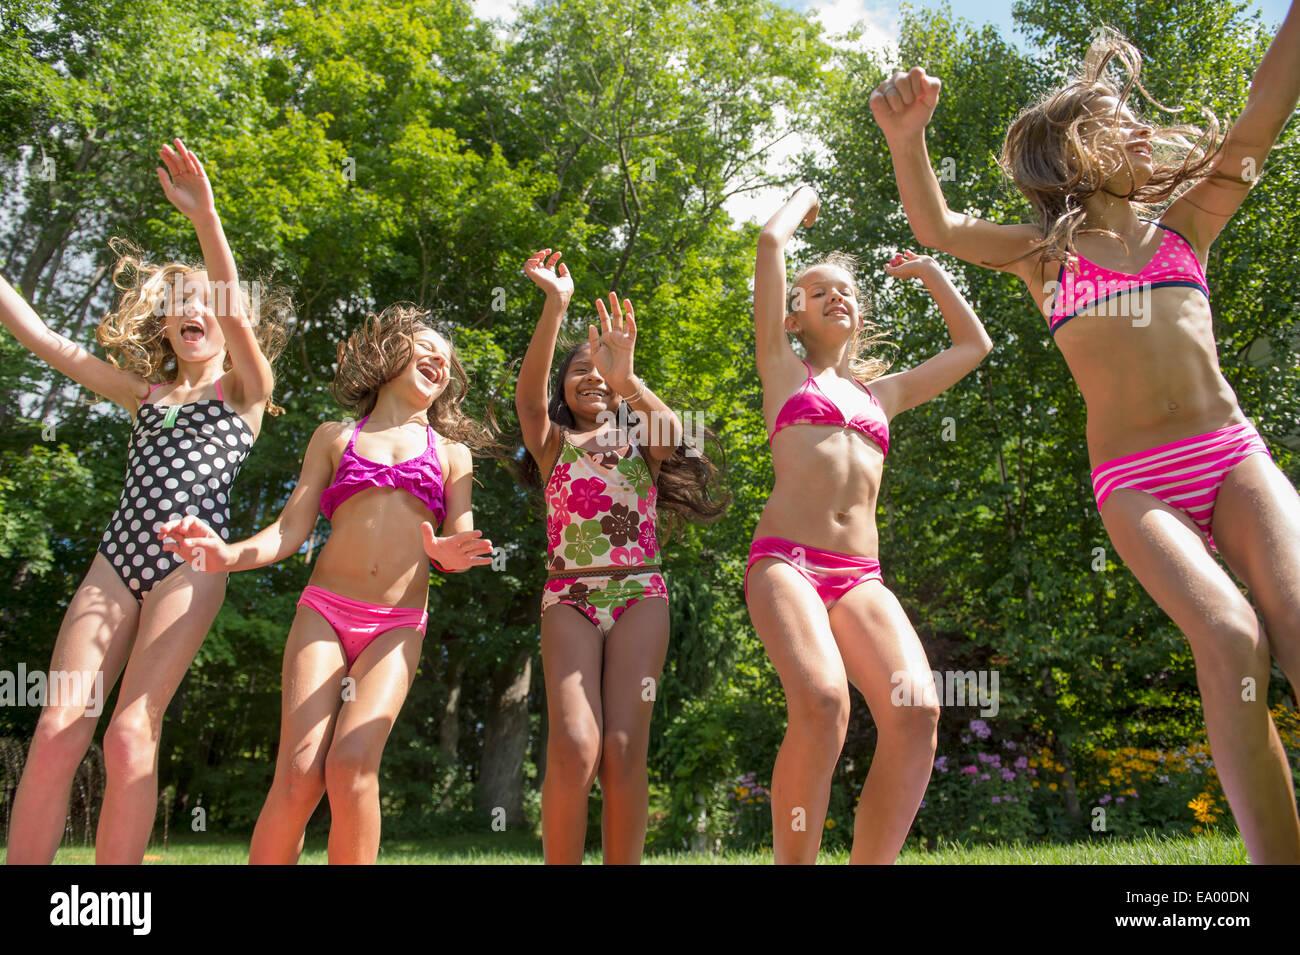 Girls In Swimming Costume Jumping In Garden